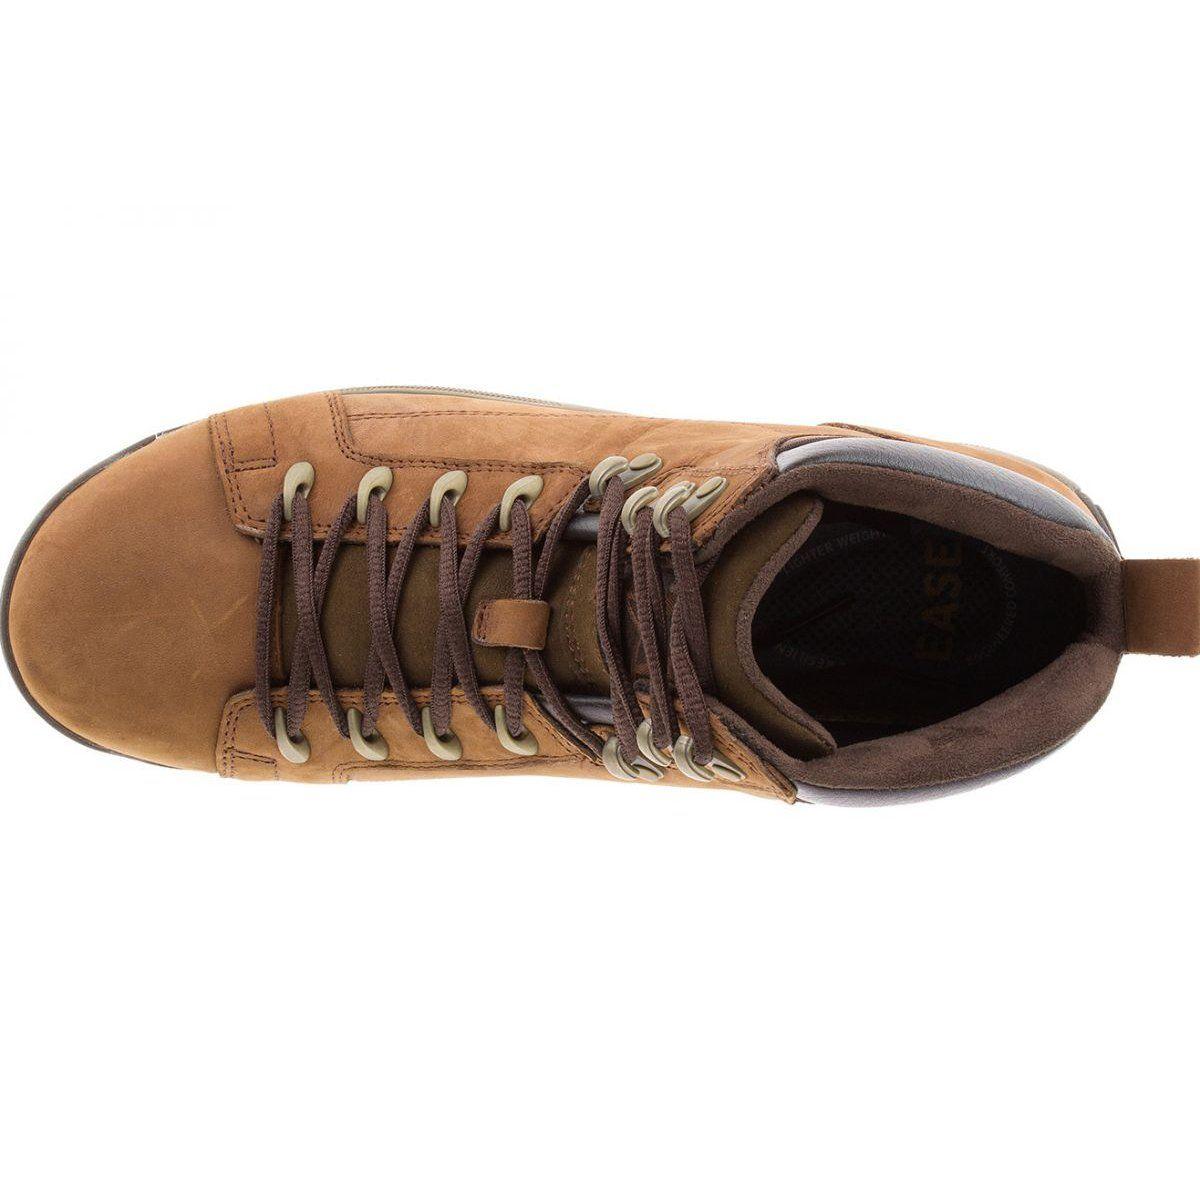 Caterpillar Supersede M P720290 Shoes Brown Sport Shoes Men Shoes Nubuck Leather